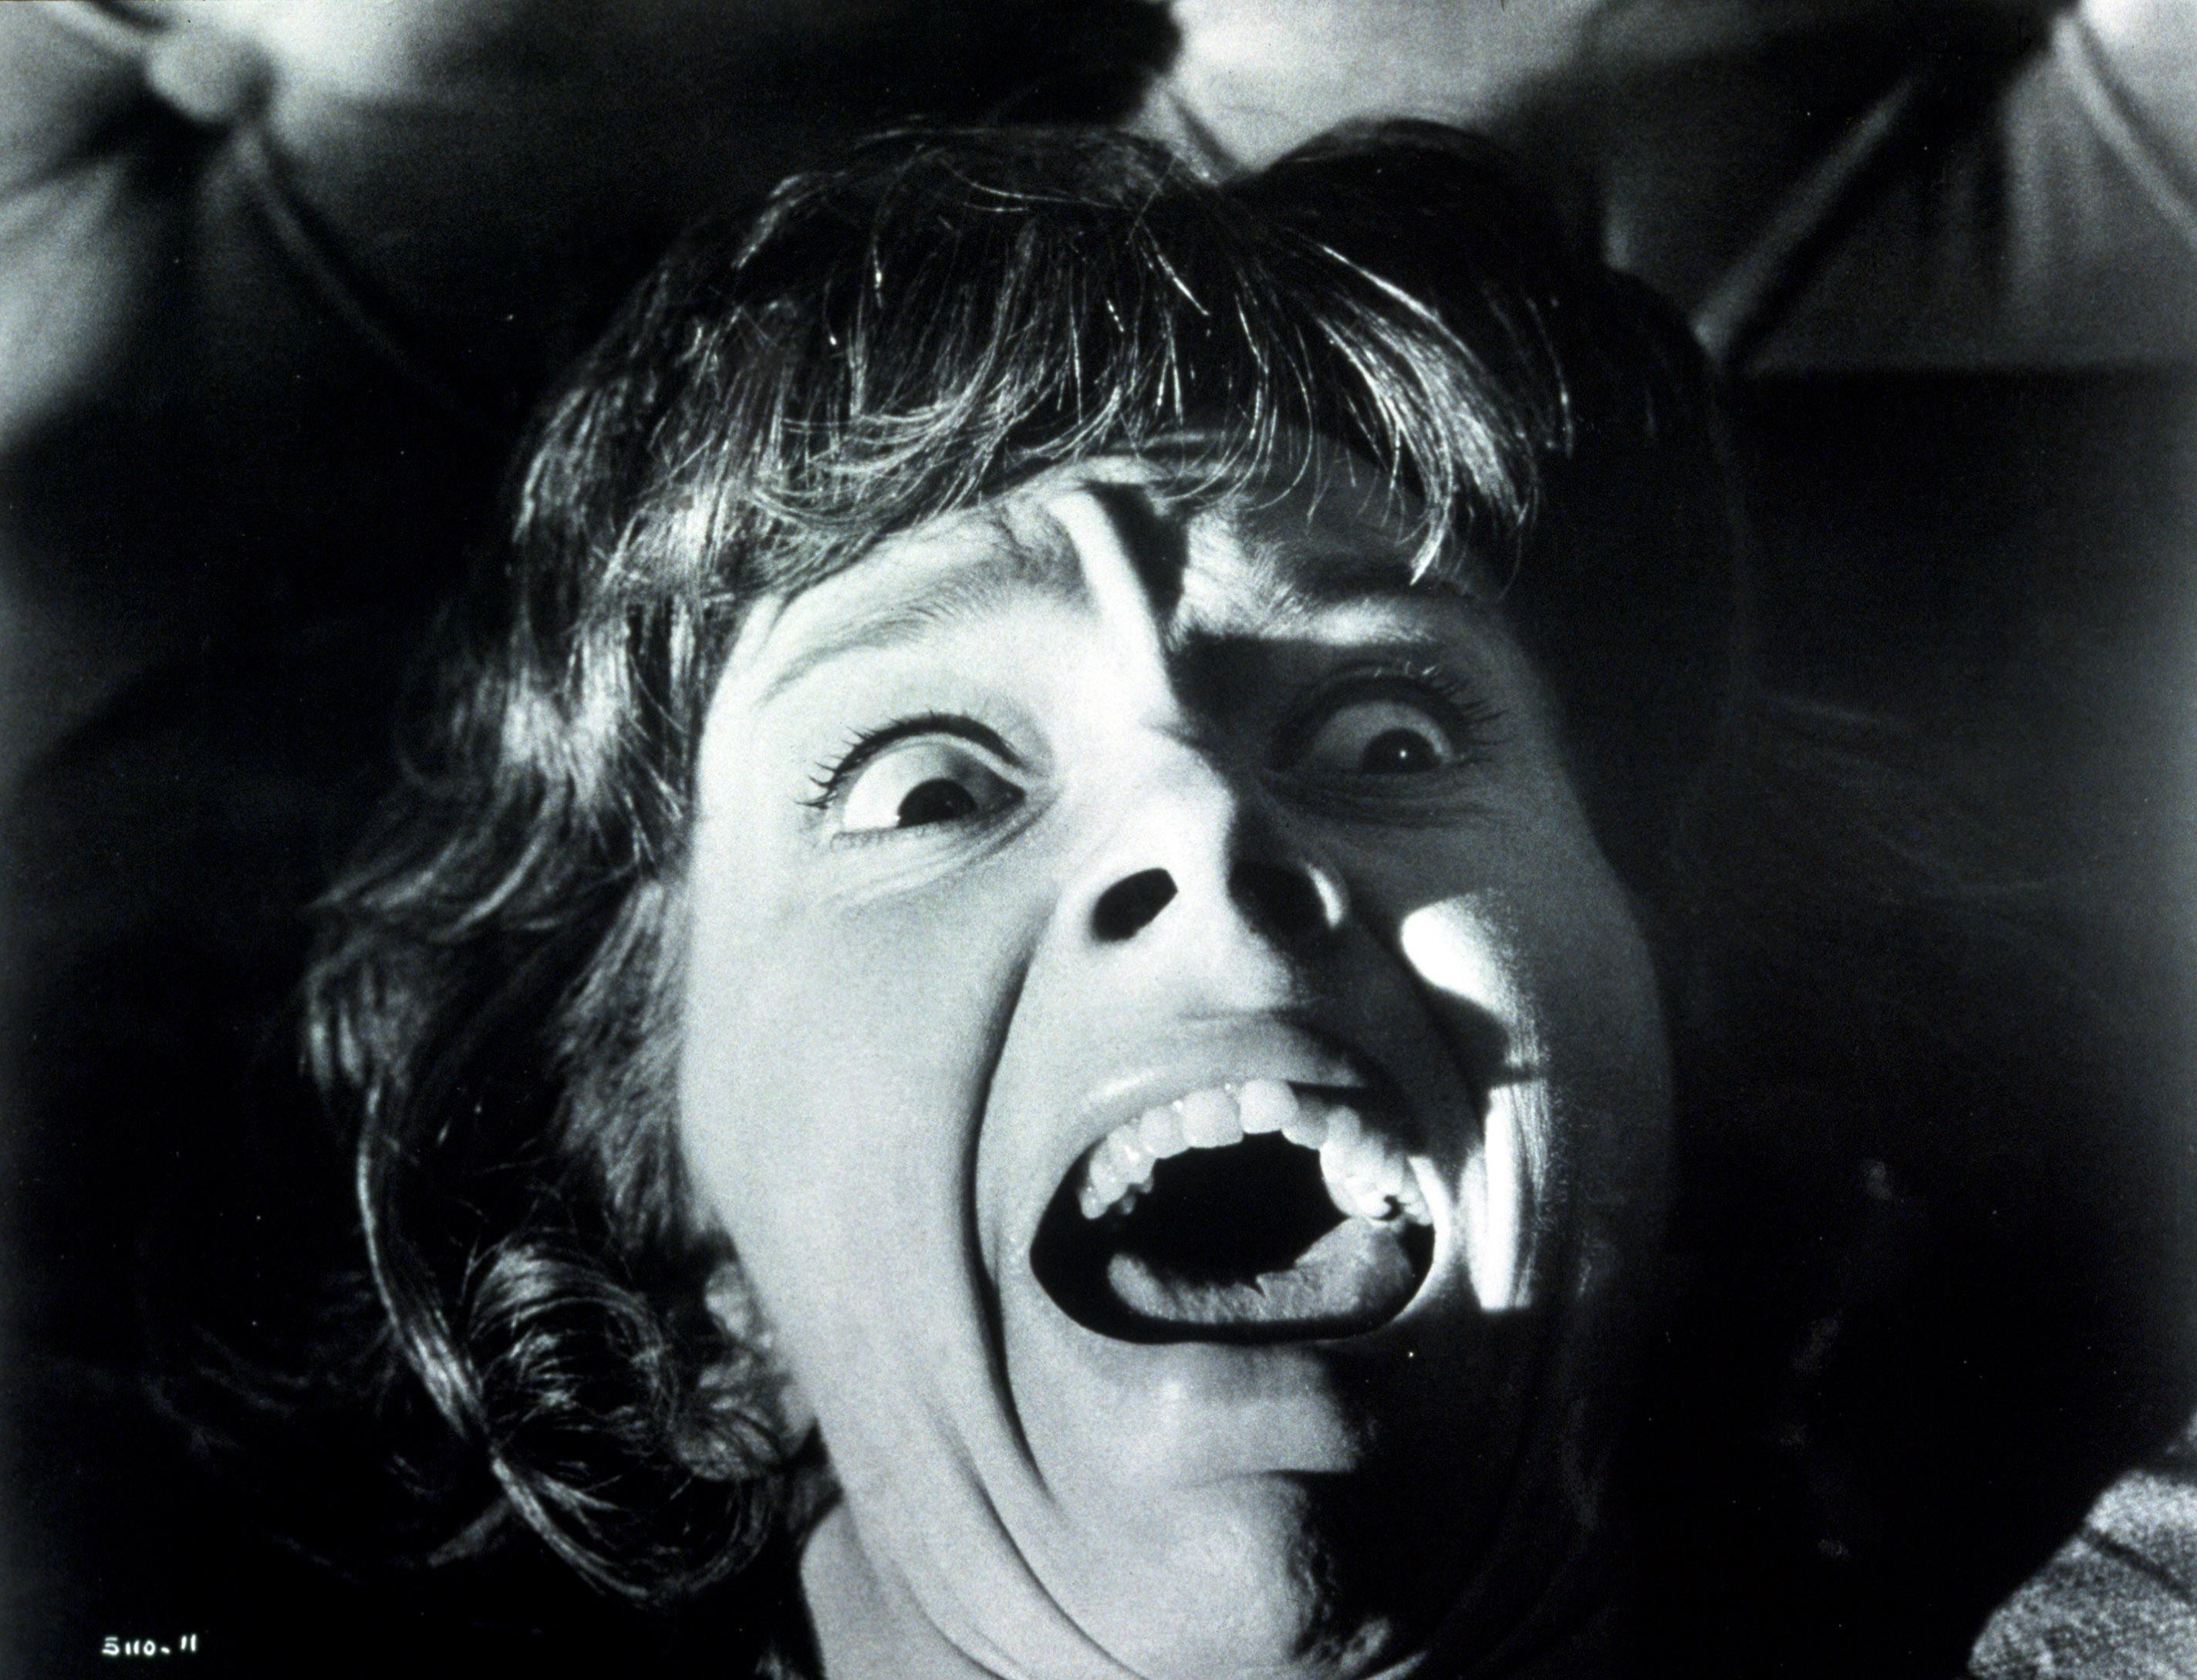 Frenzy Hitchcock